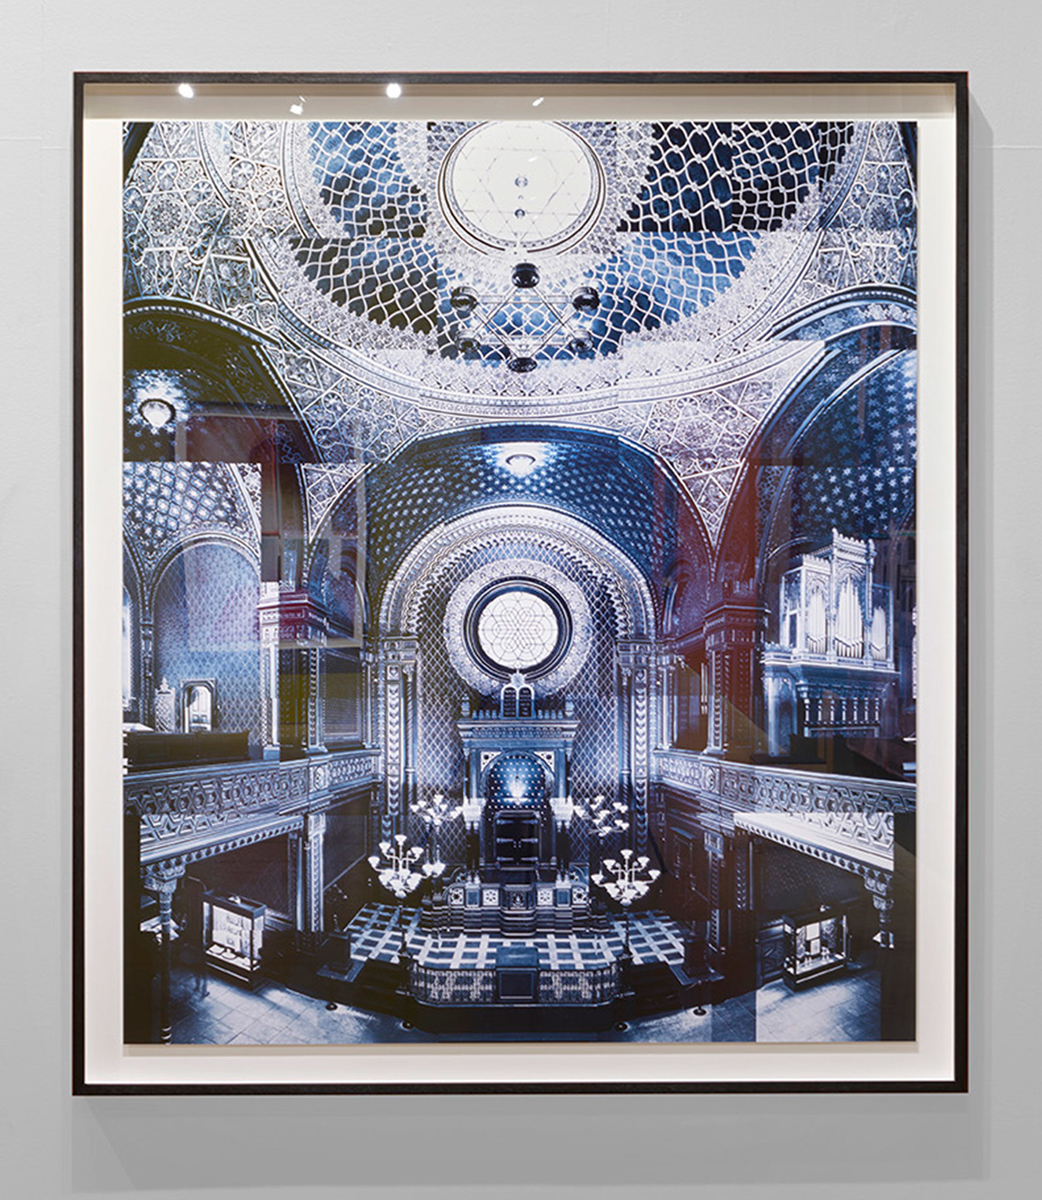 Kolehmainen_Ola_Spanish_Synagogue_2017_01